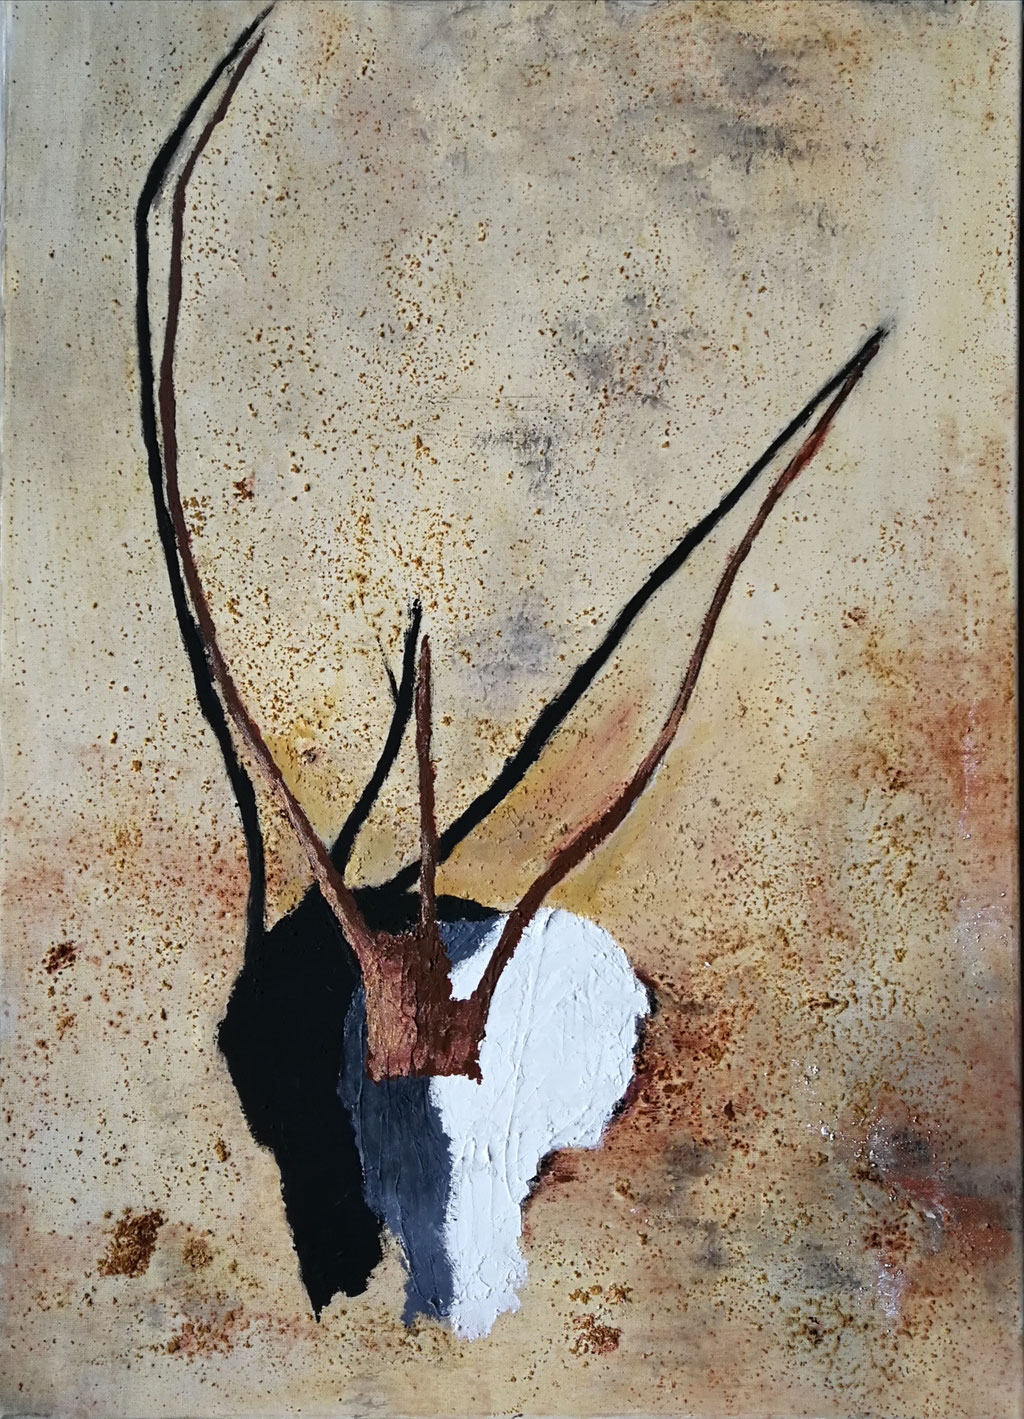 Gazelle 2019, Acryl auf Leinwand 50x70, vergeben